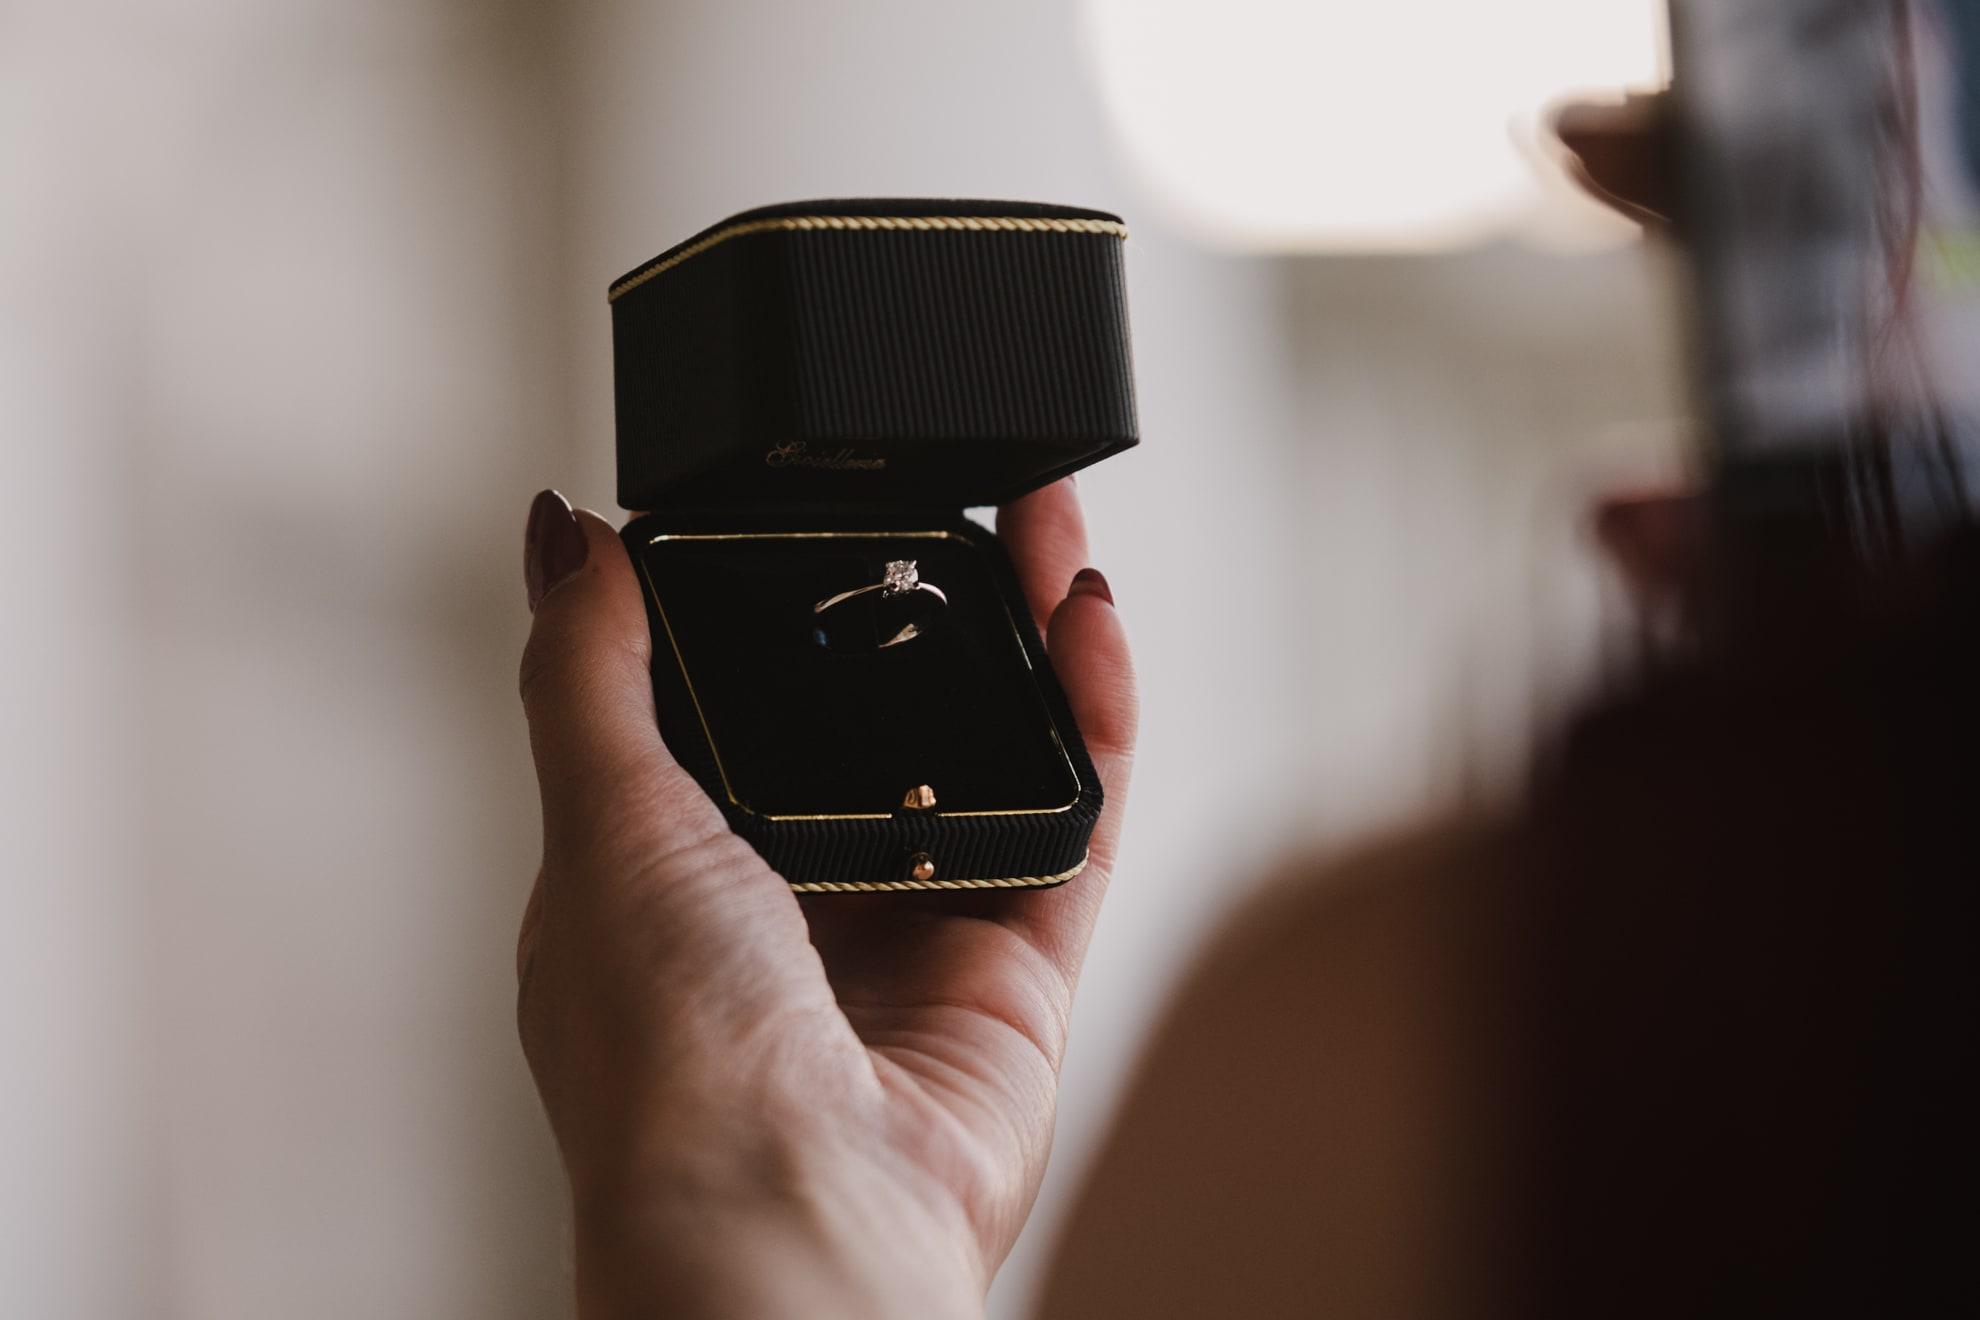 engagement venice venezia proposal proposta matrimonio fidanzamento irene pollacchi fotografa 34